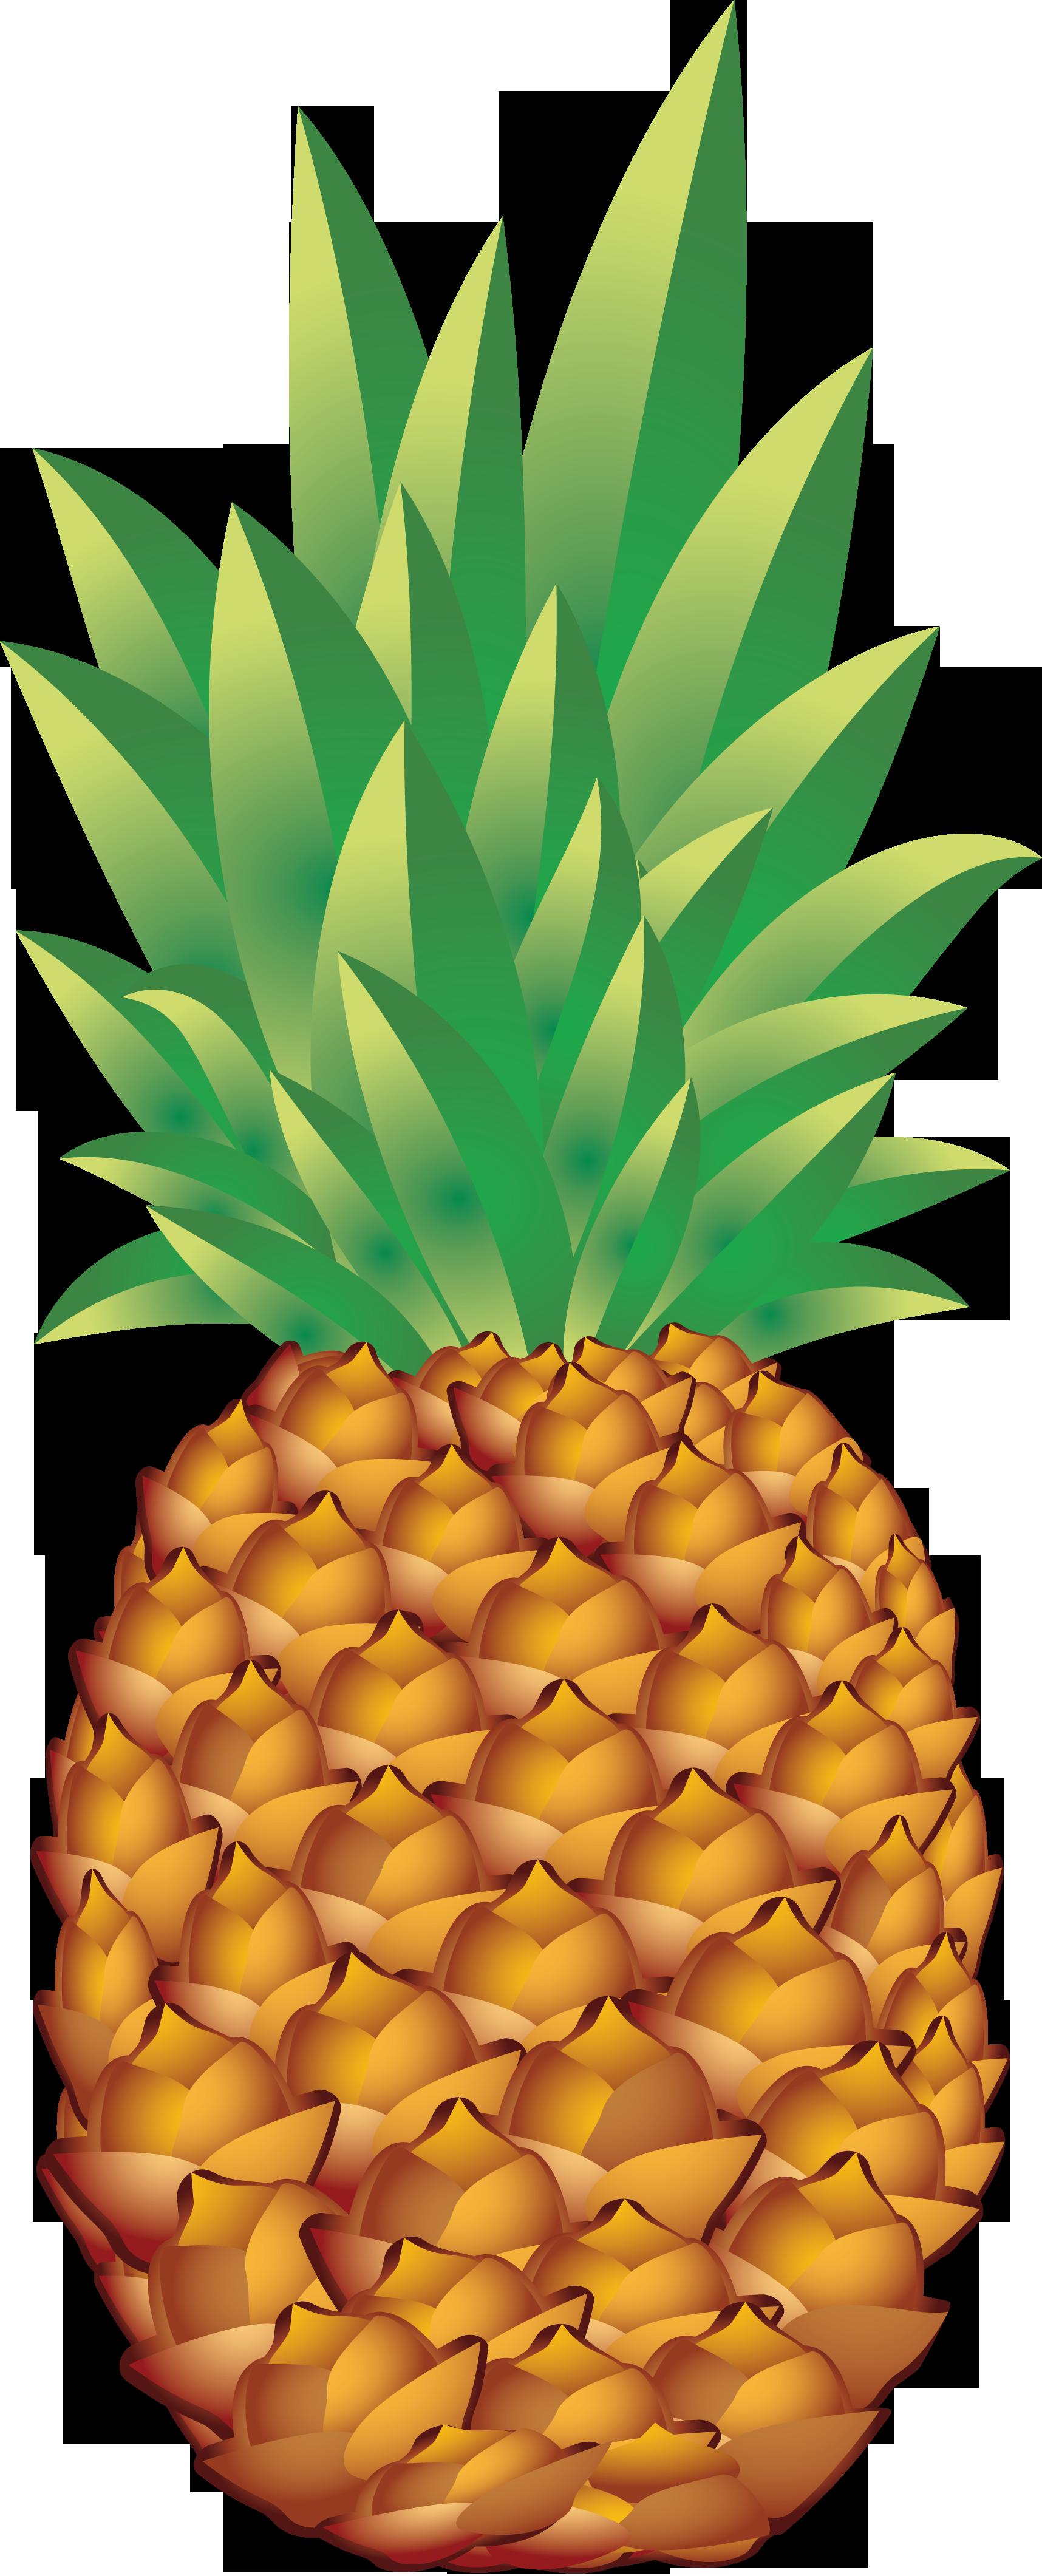 tumblr pineapple.